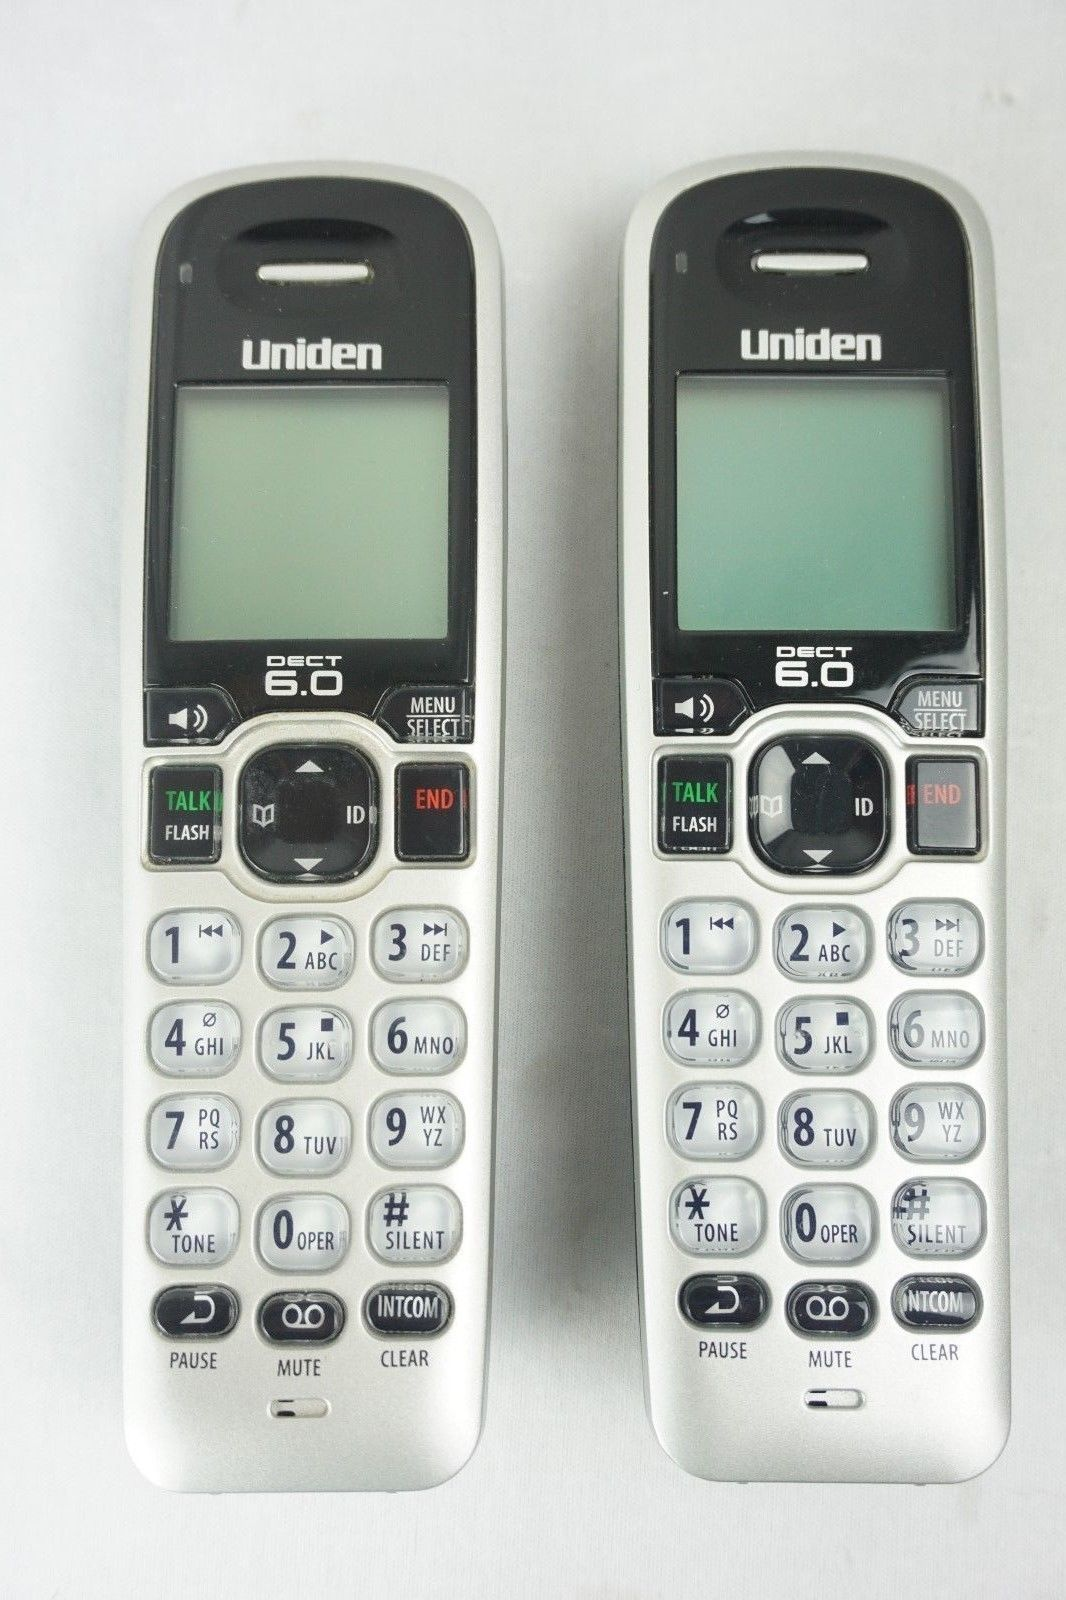 Uniden D1680-3 DECT 6.0 Cordless Phone Answering System 3 Handsets Expandable image 7